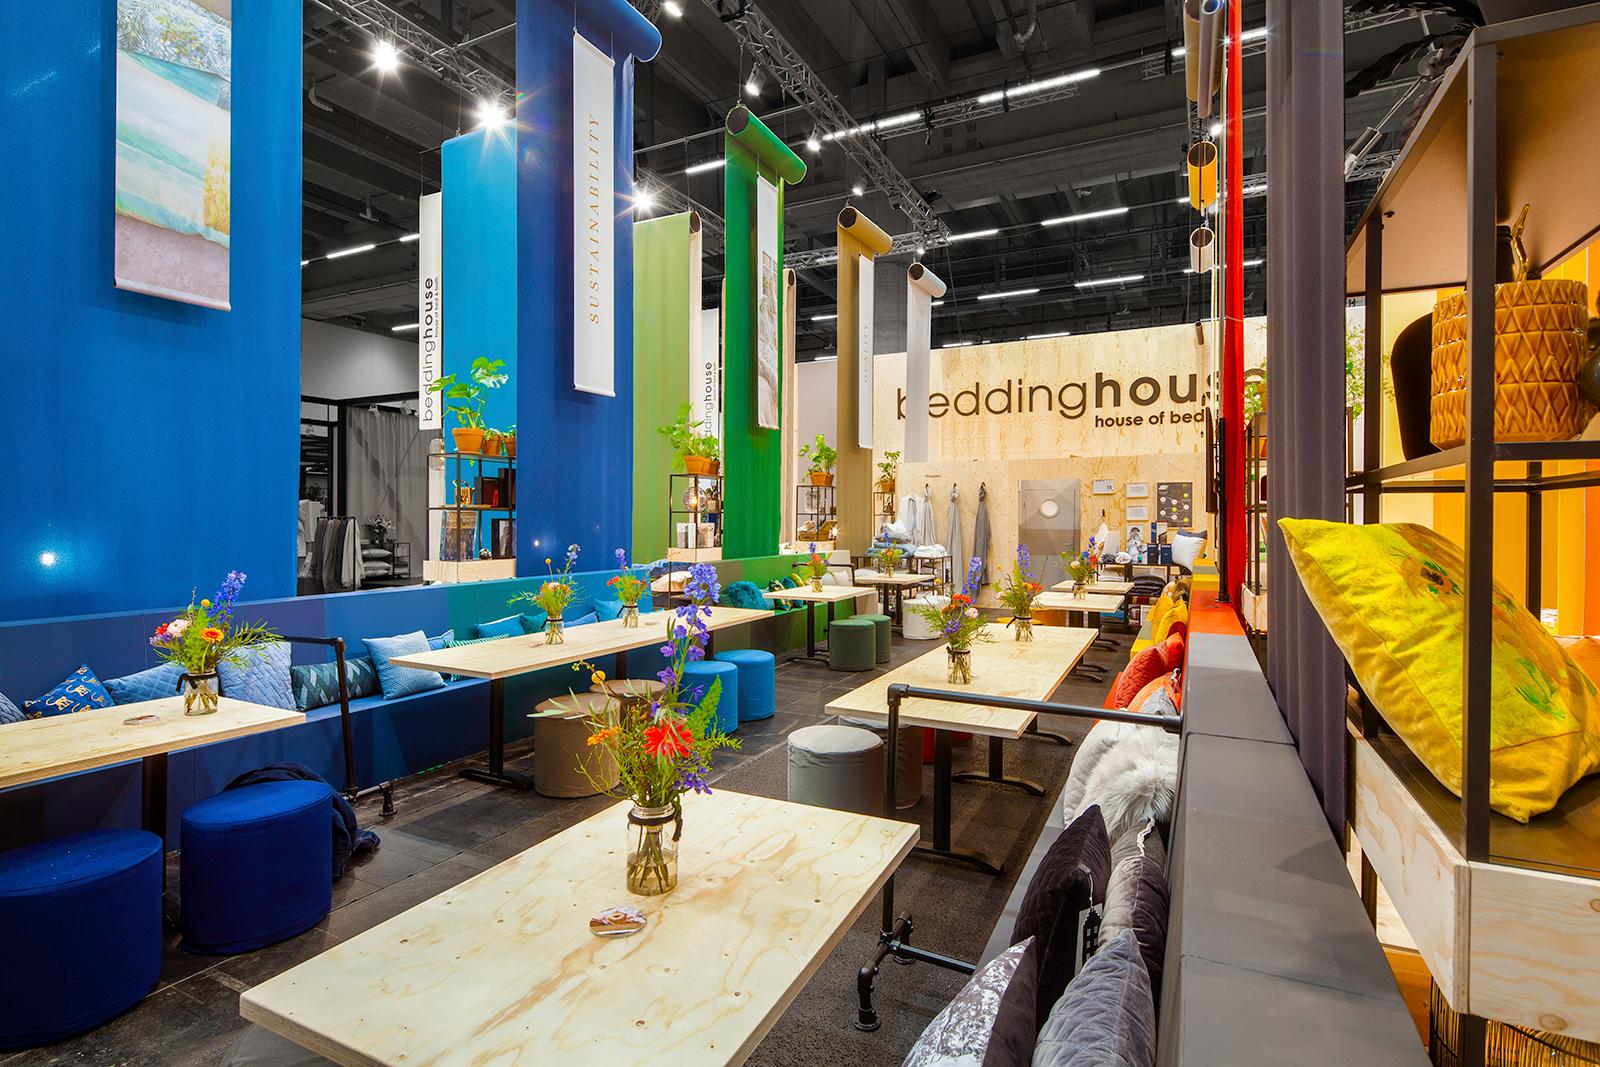 The Inside - Beddinghouse - Heimtextil 2019 - Frankfurt - Standbouwfotografie #4143(lr)